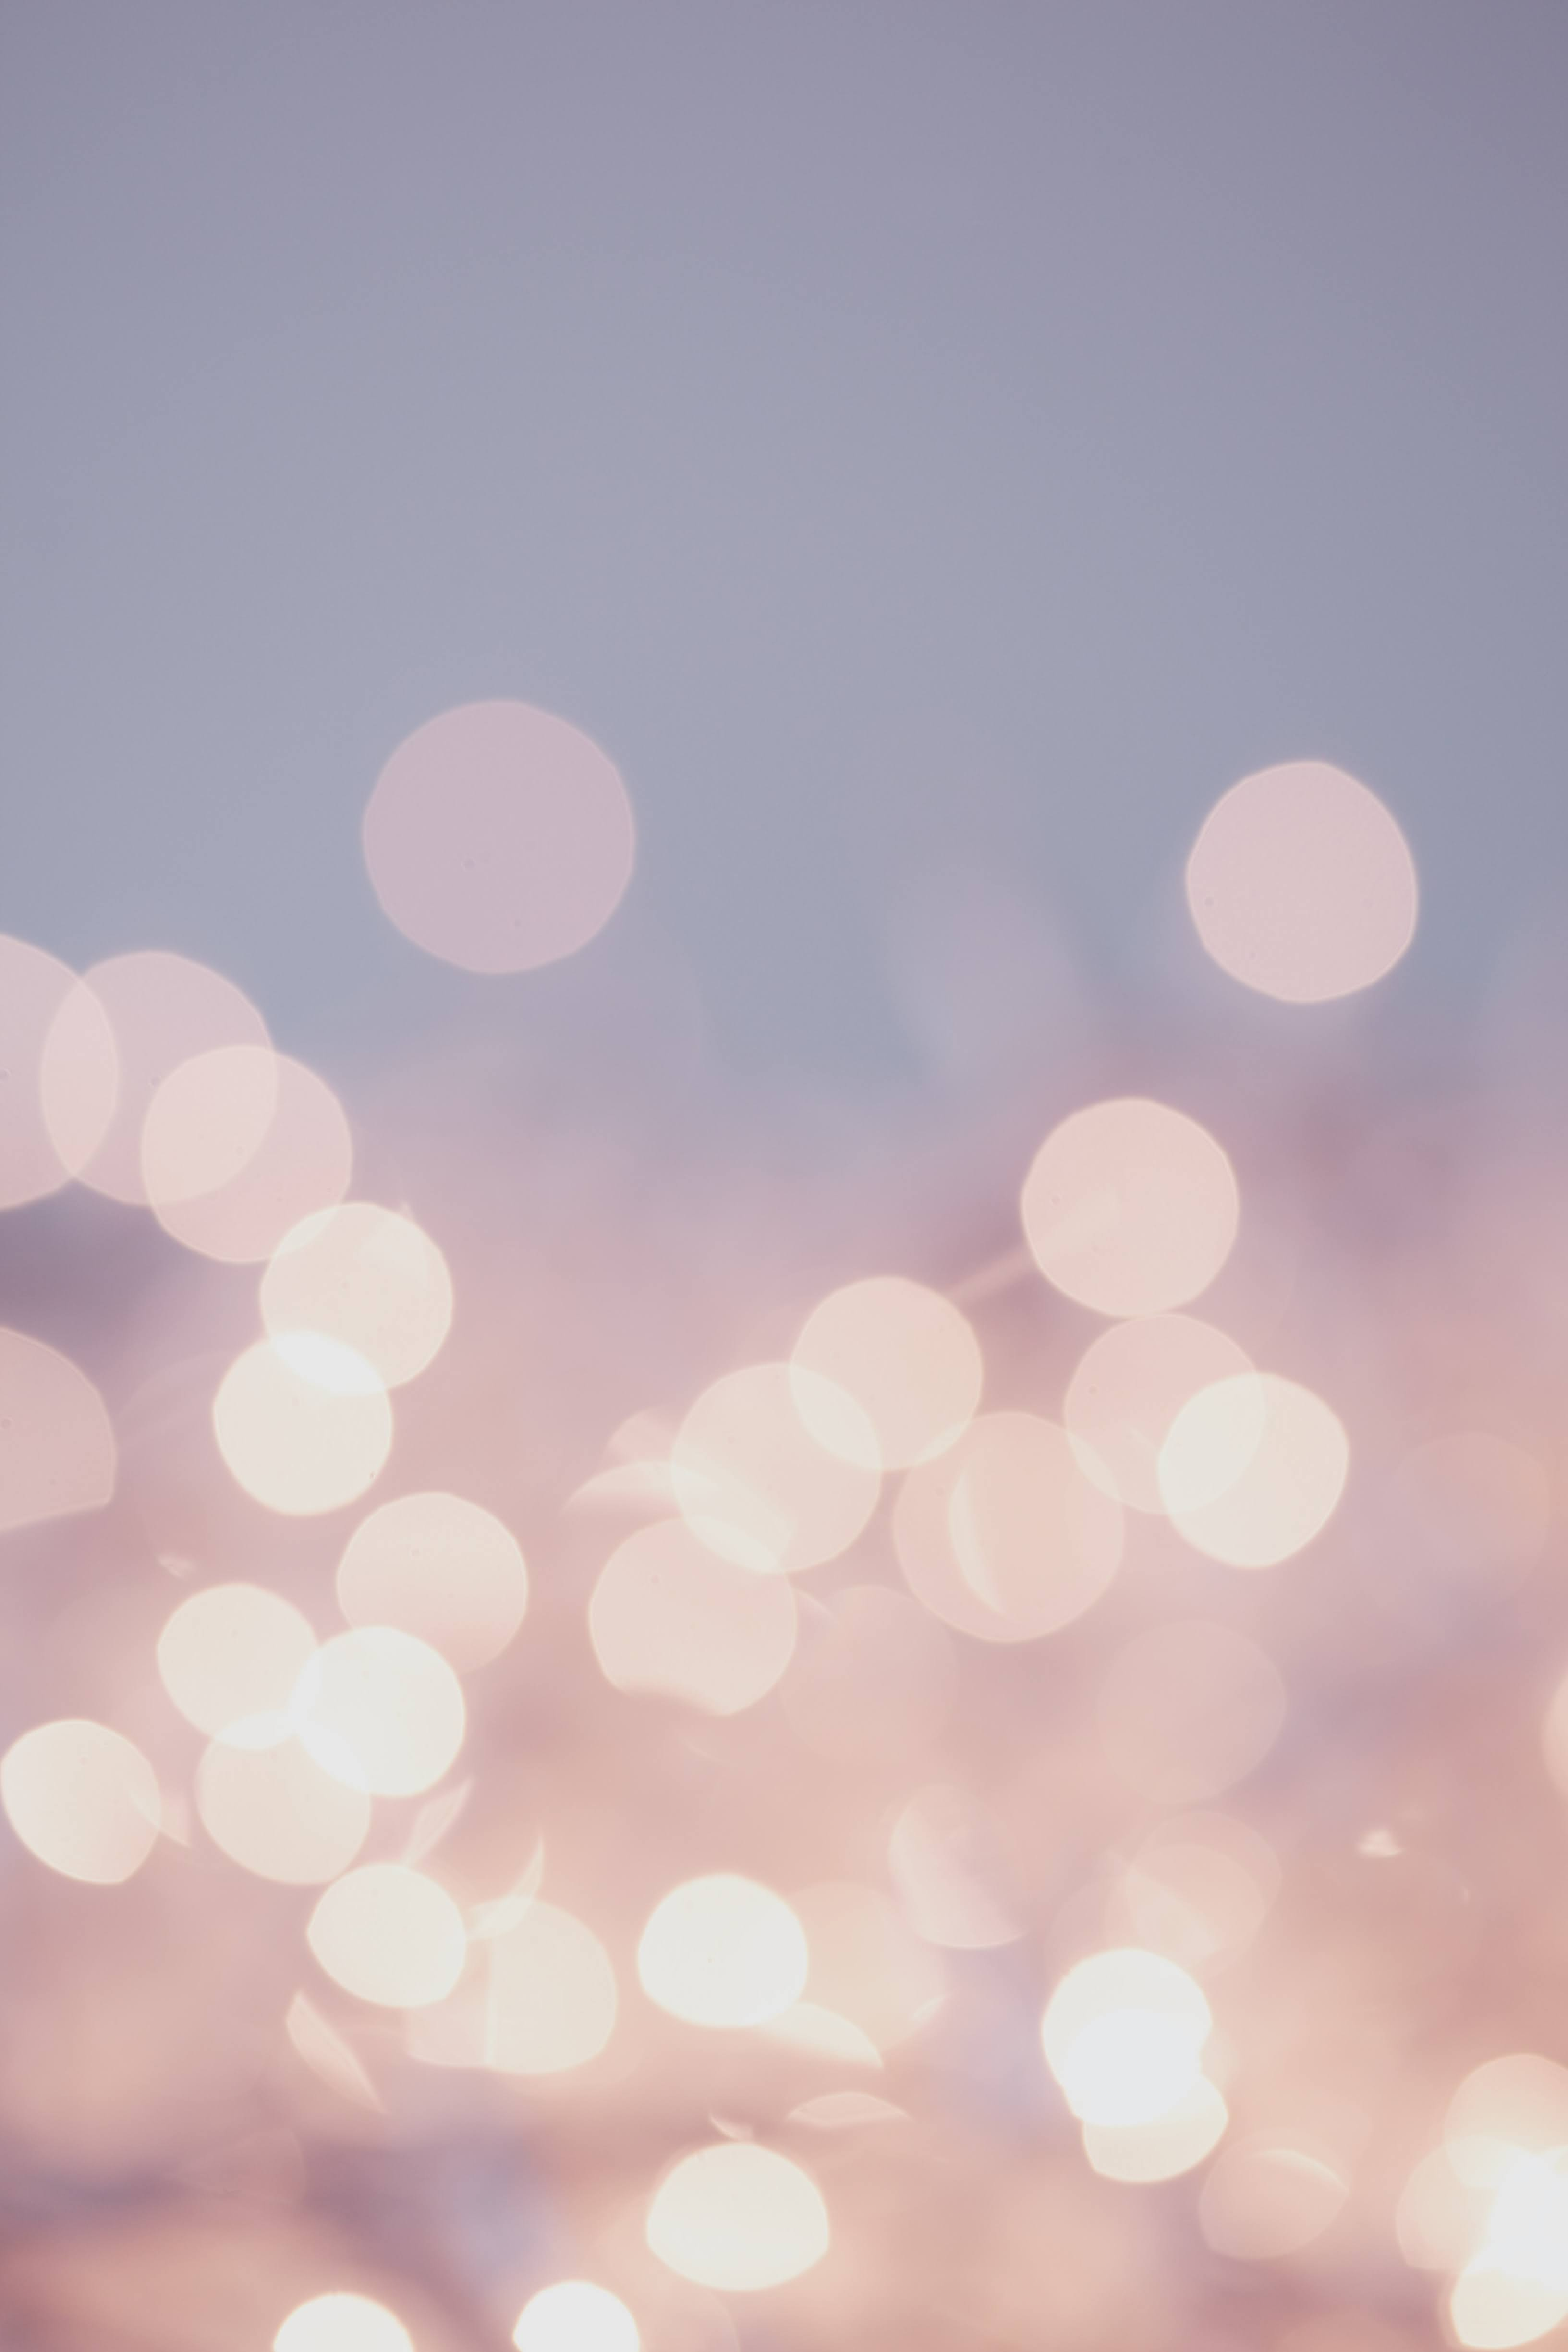 Pretty pastel bokeh fairy lights background. | Photo by Sharon McCutcheon via Unsplash